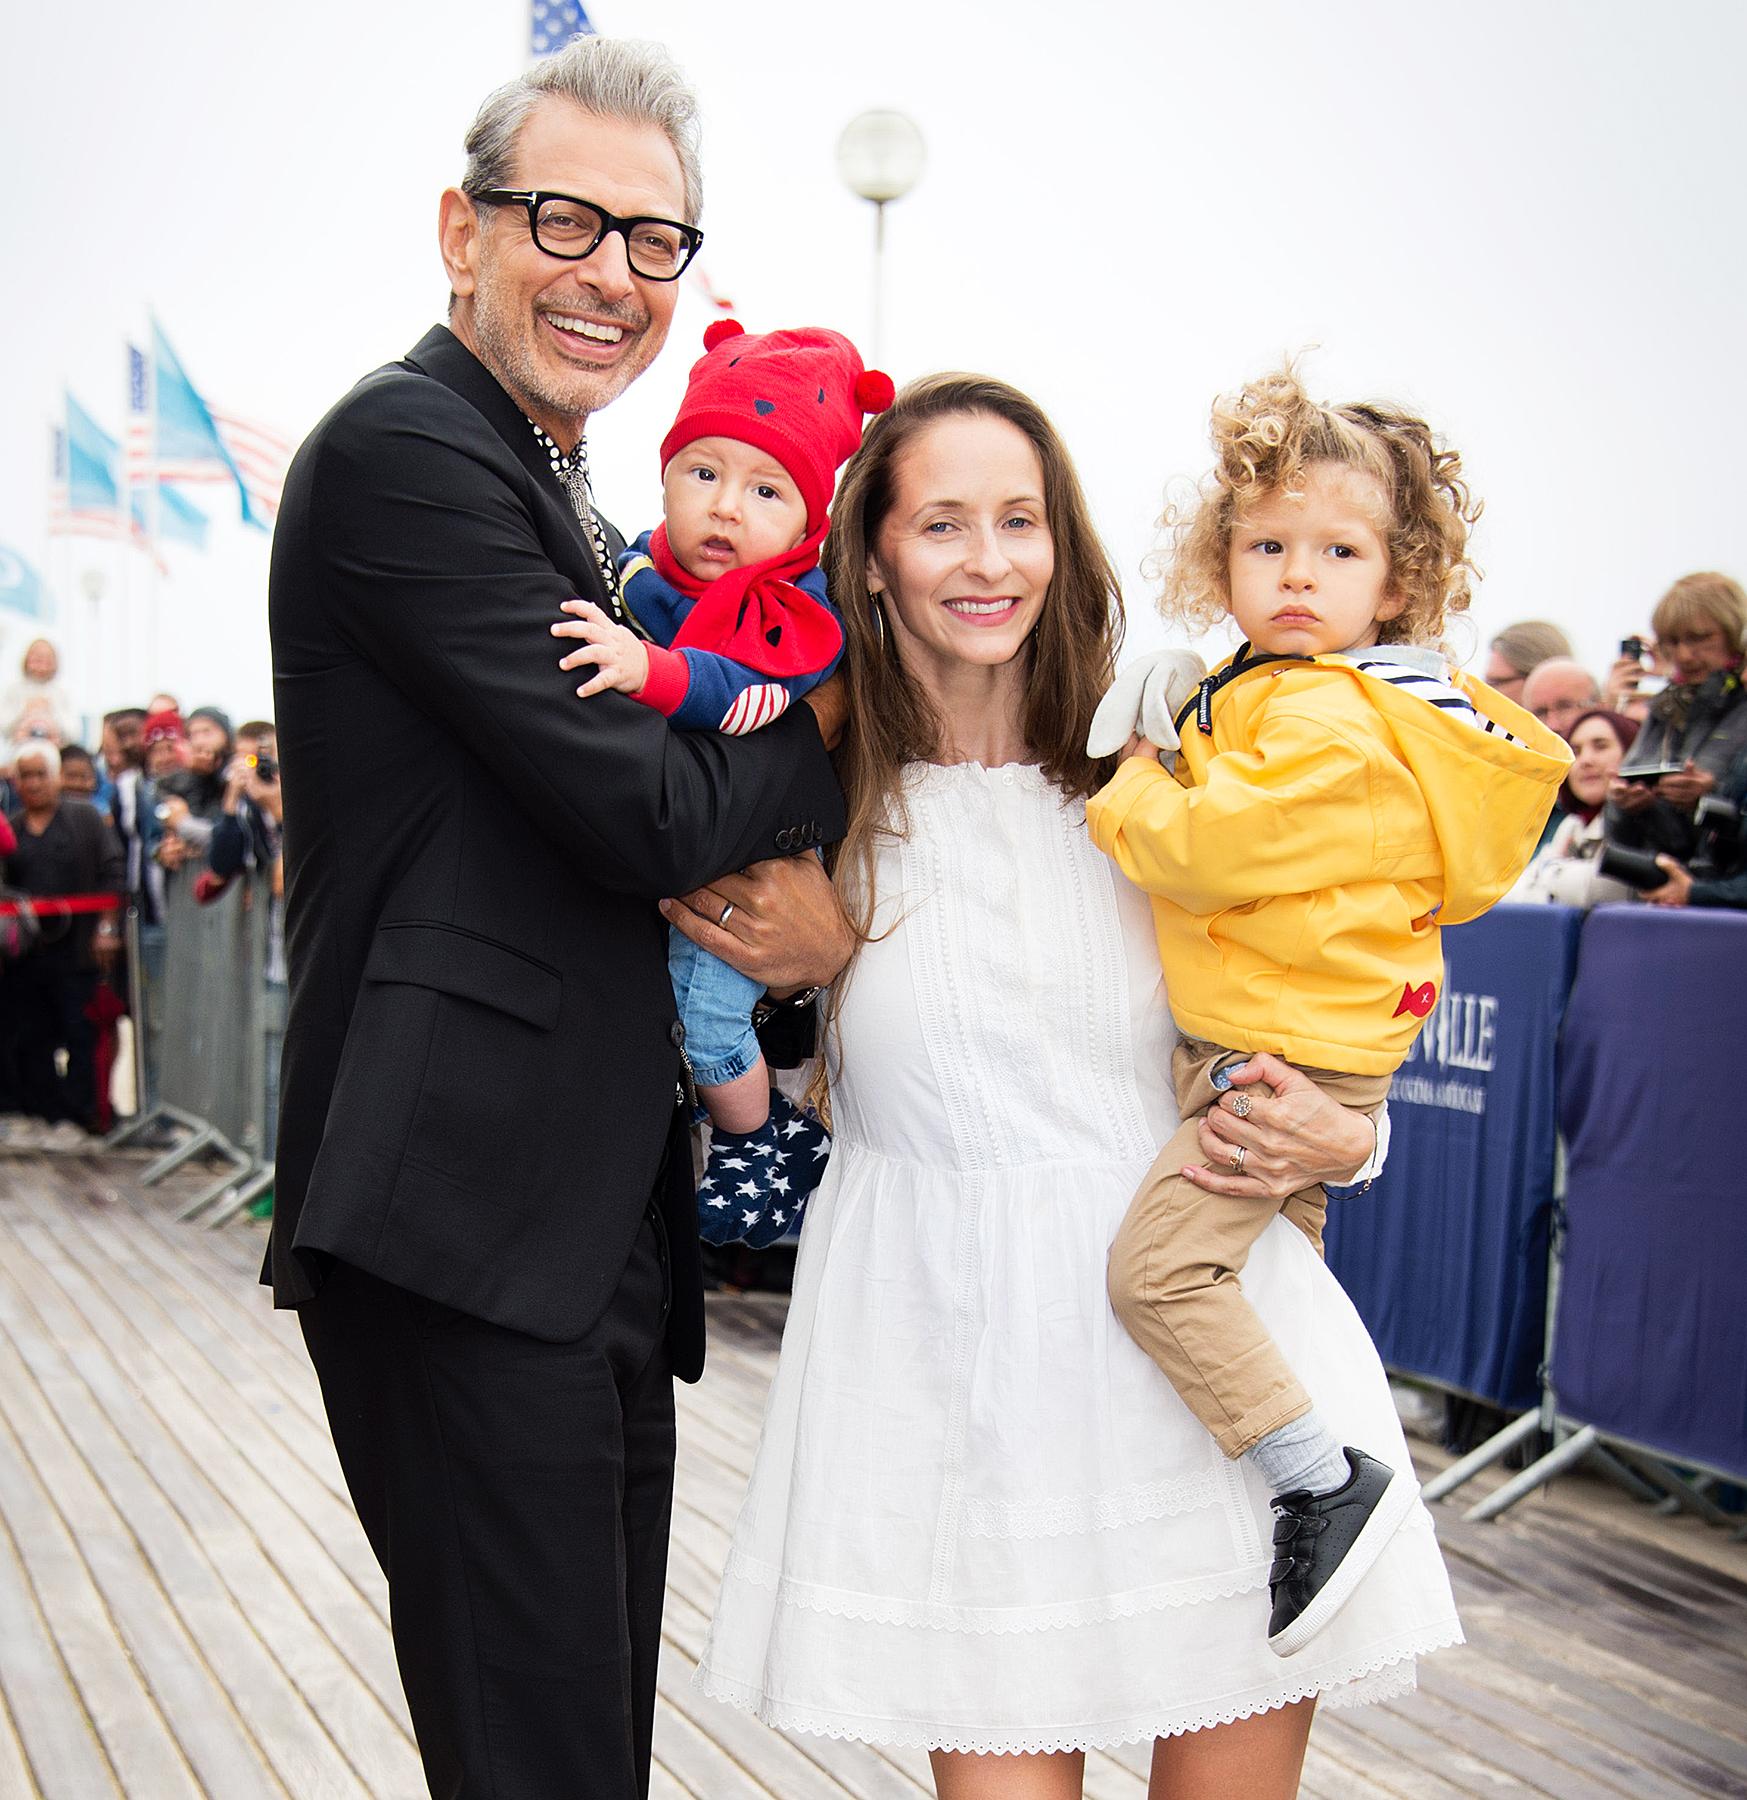 Jeff Goldblum Opens Up About Being an Older Dad